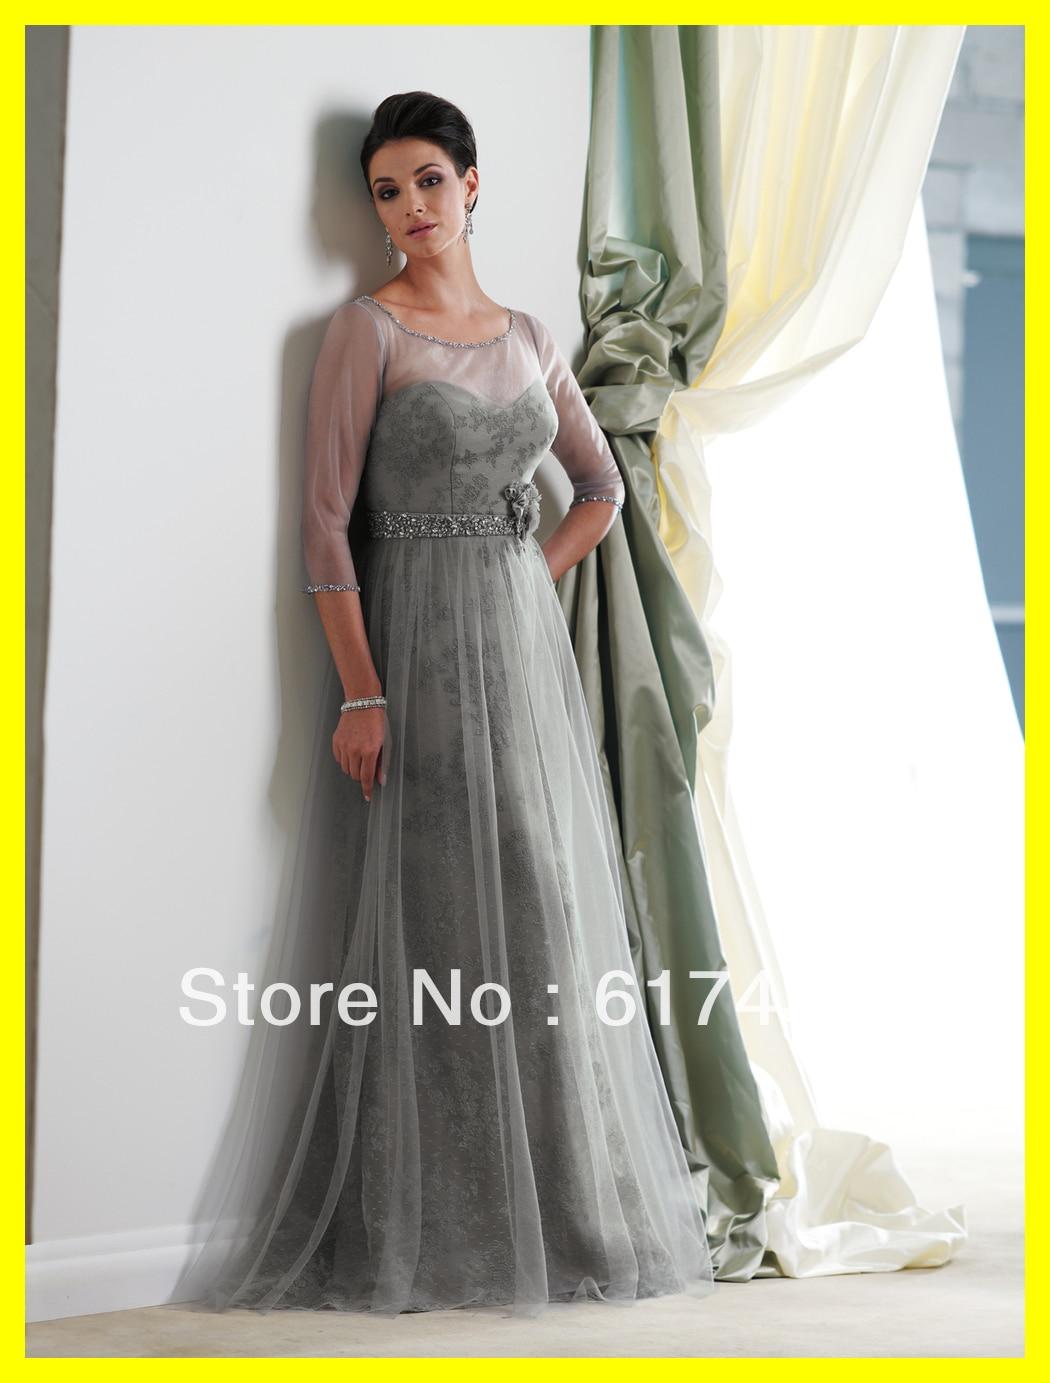 Plus Size Formal Dresses Elegant Mother Of The Bride Separates ...